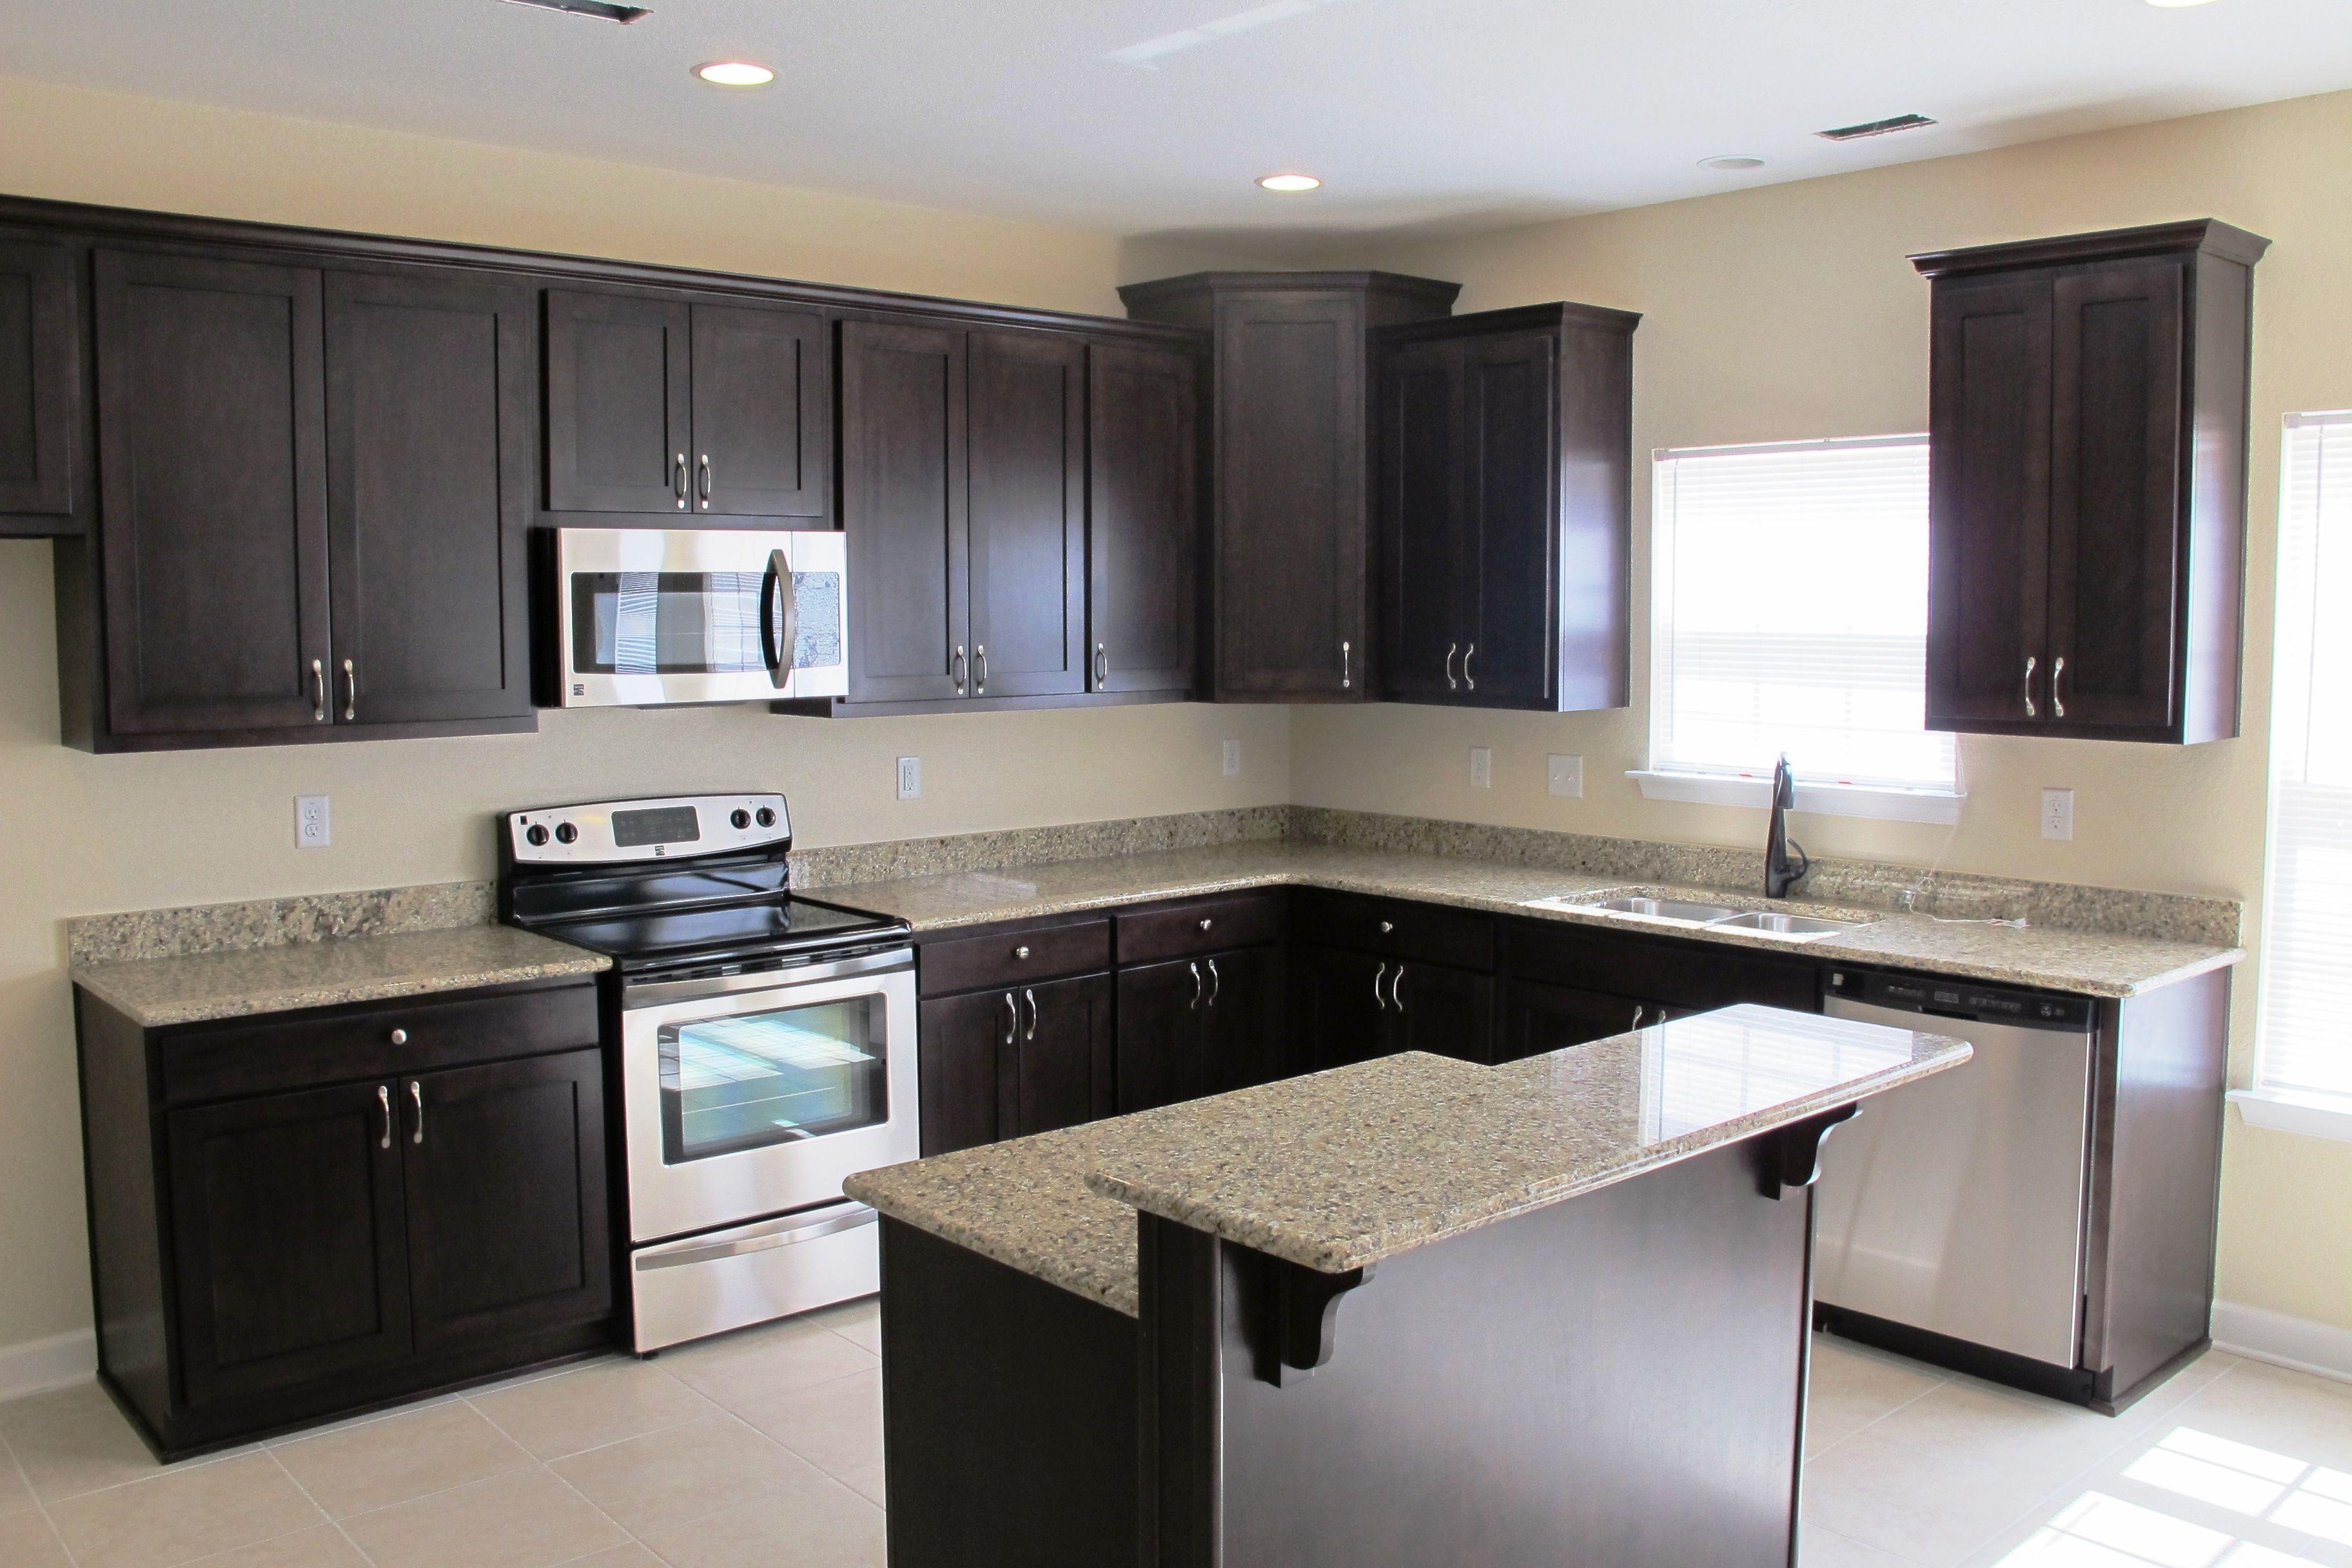 Picture of Small L Shaped Kitchen Design Dark Cabinet  Kitchen